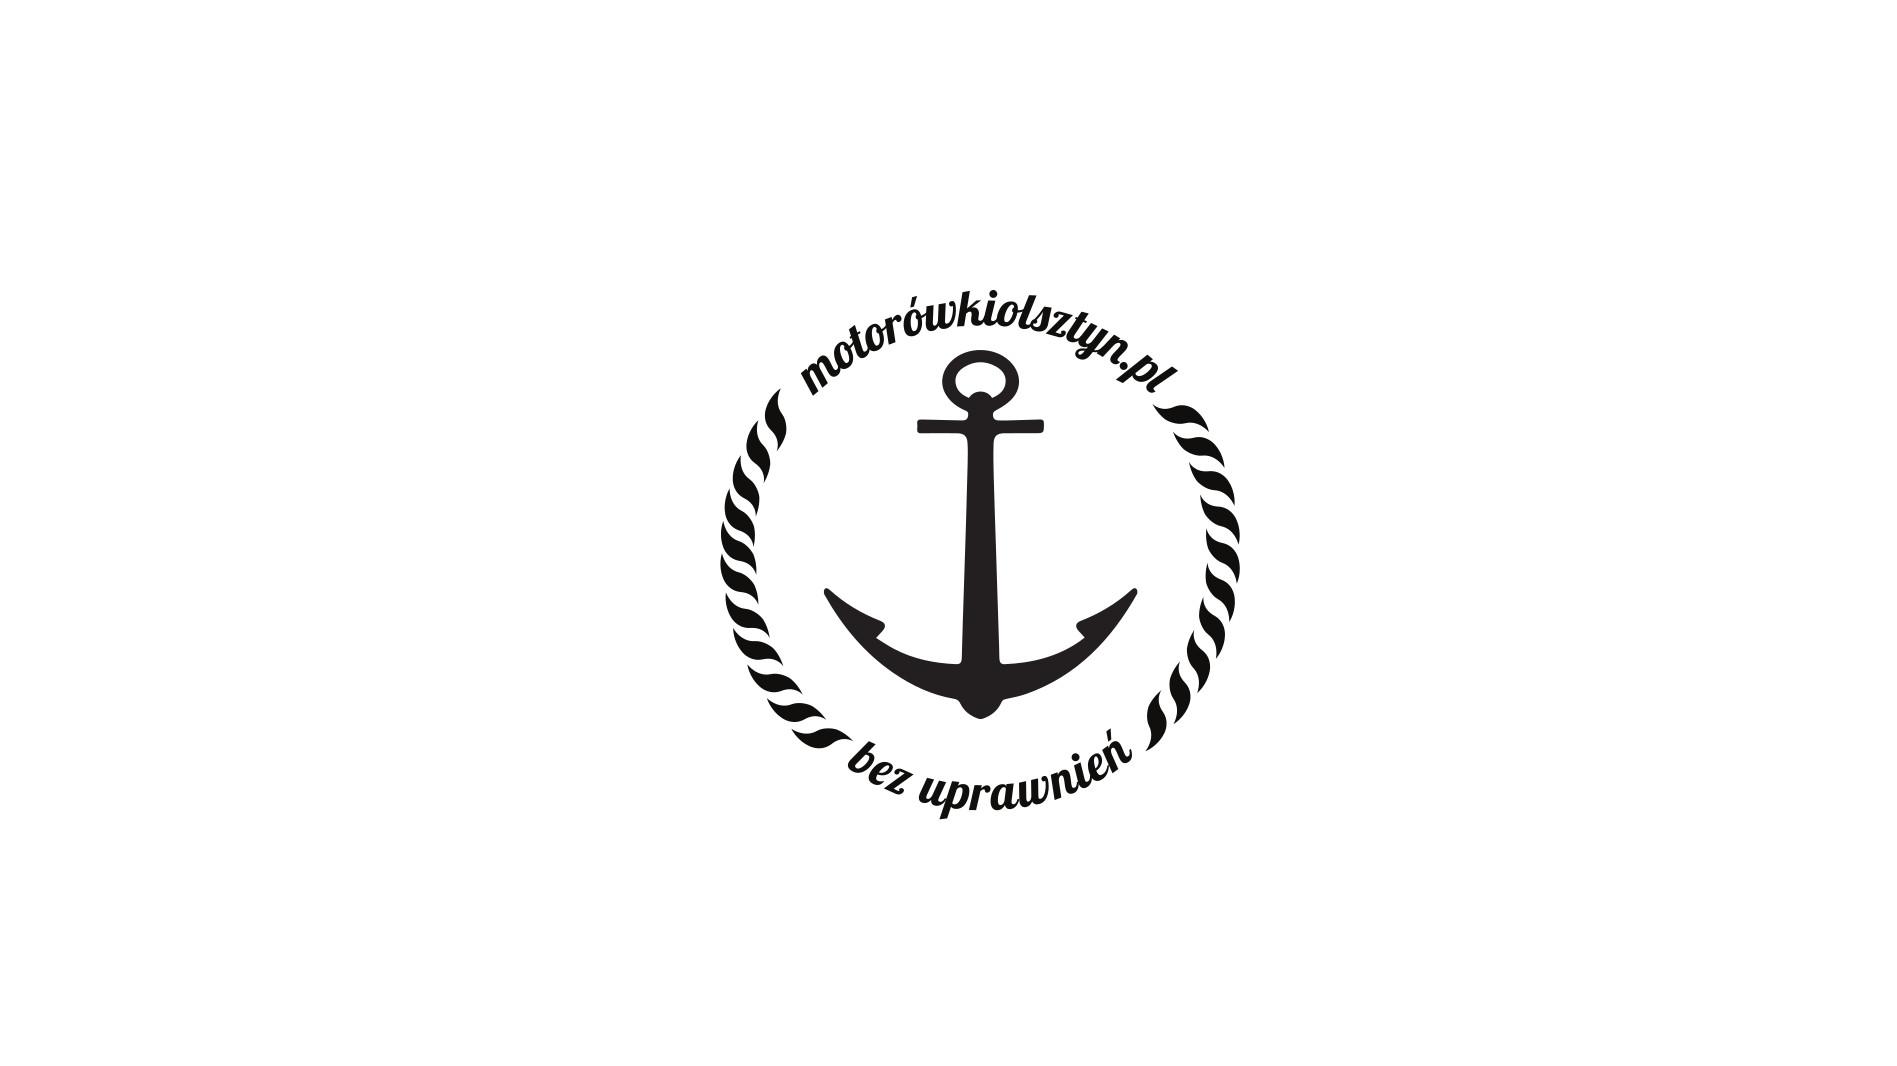 https://m.wm.pl/2019/04/orig/moto-bez-uprawnien-logo-543472.jpg